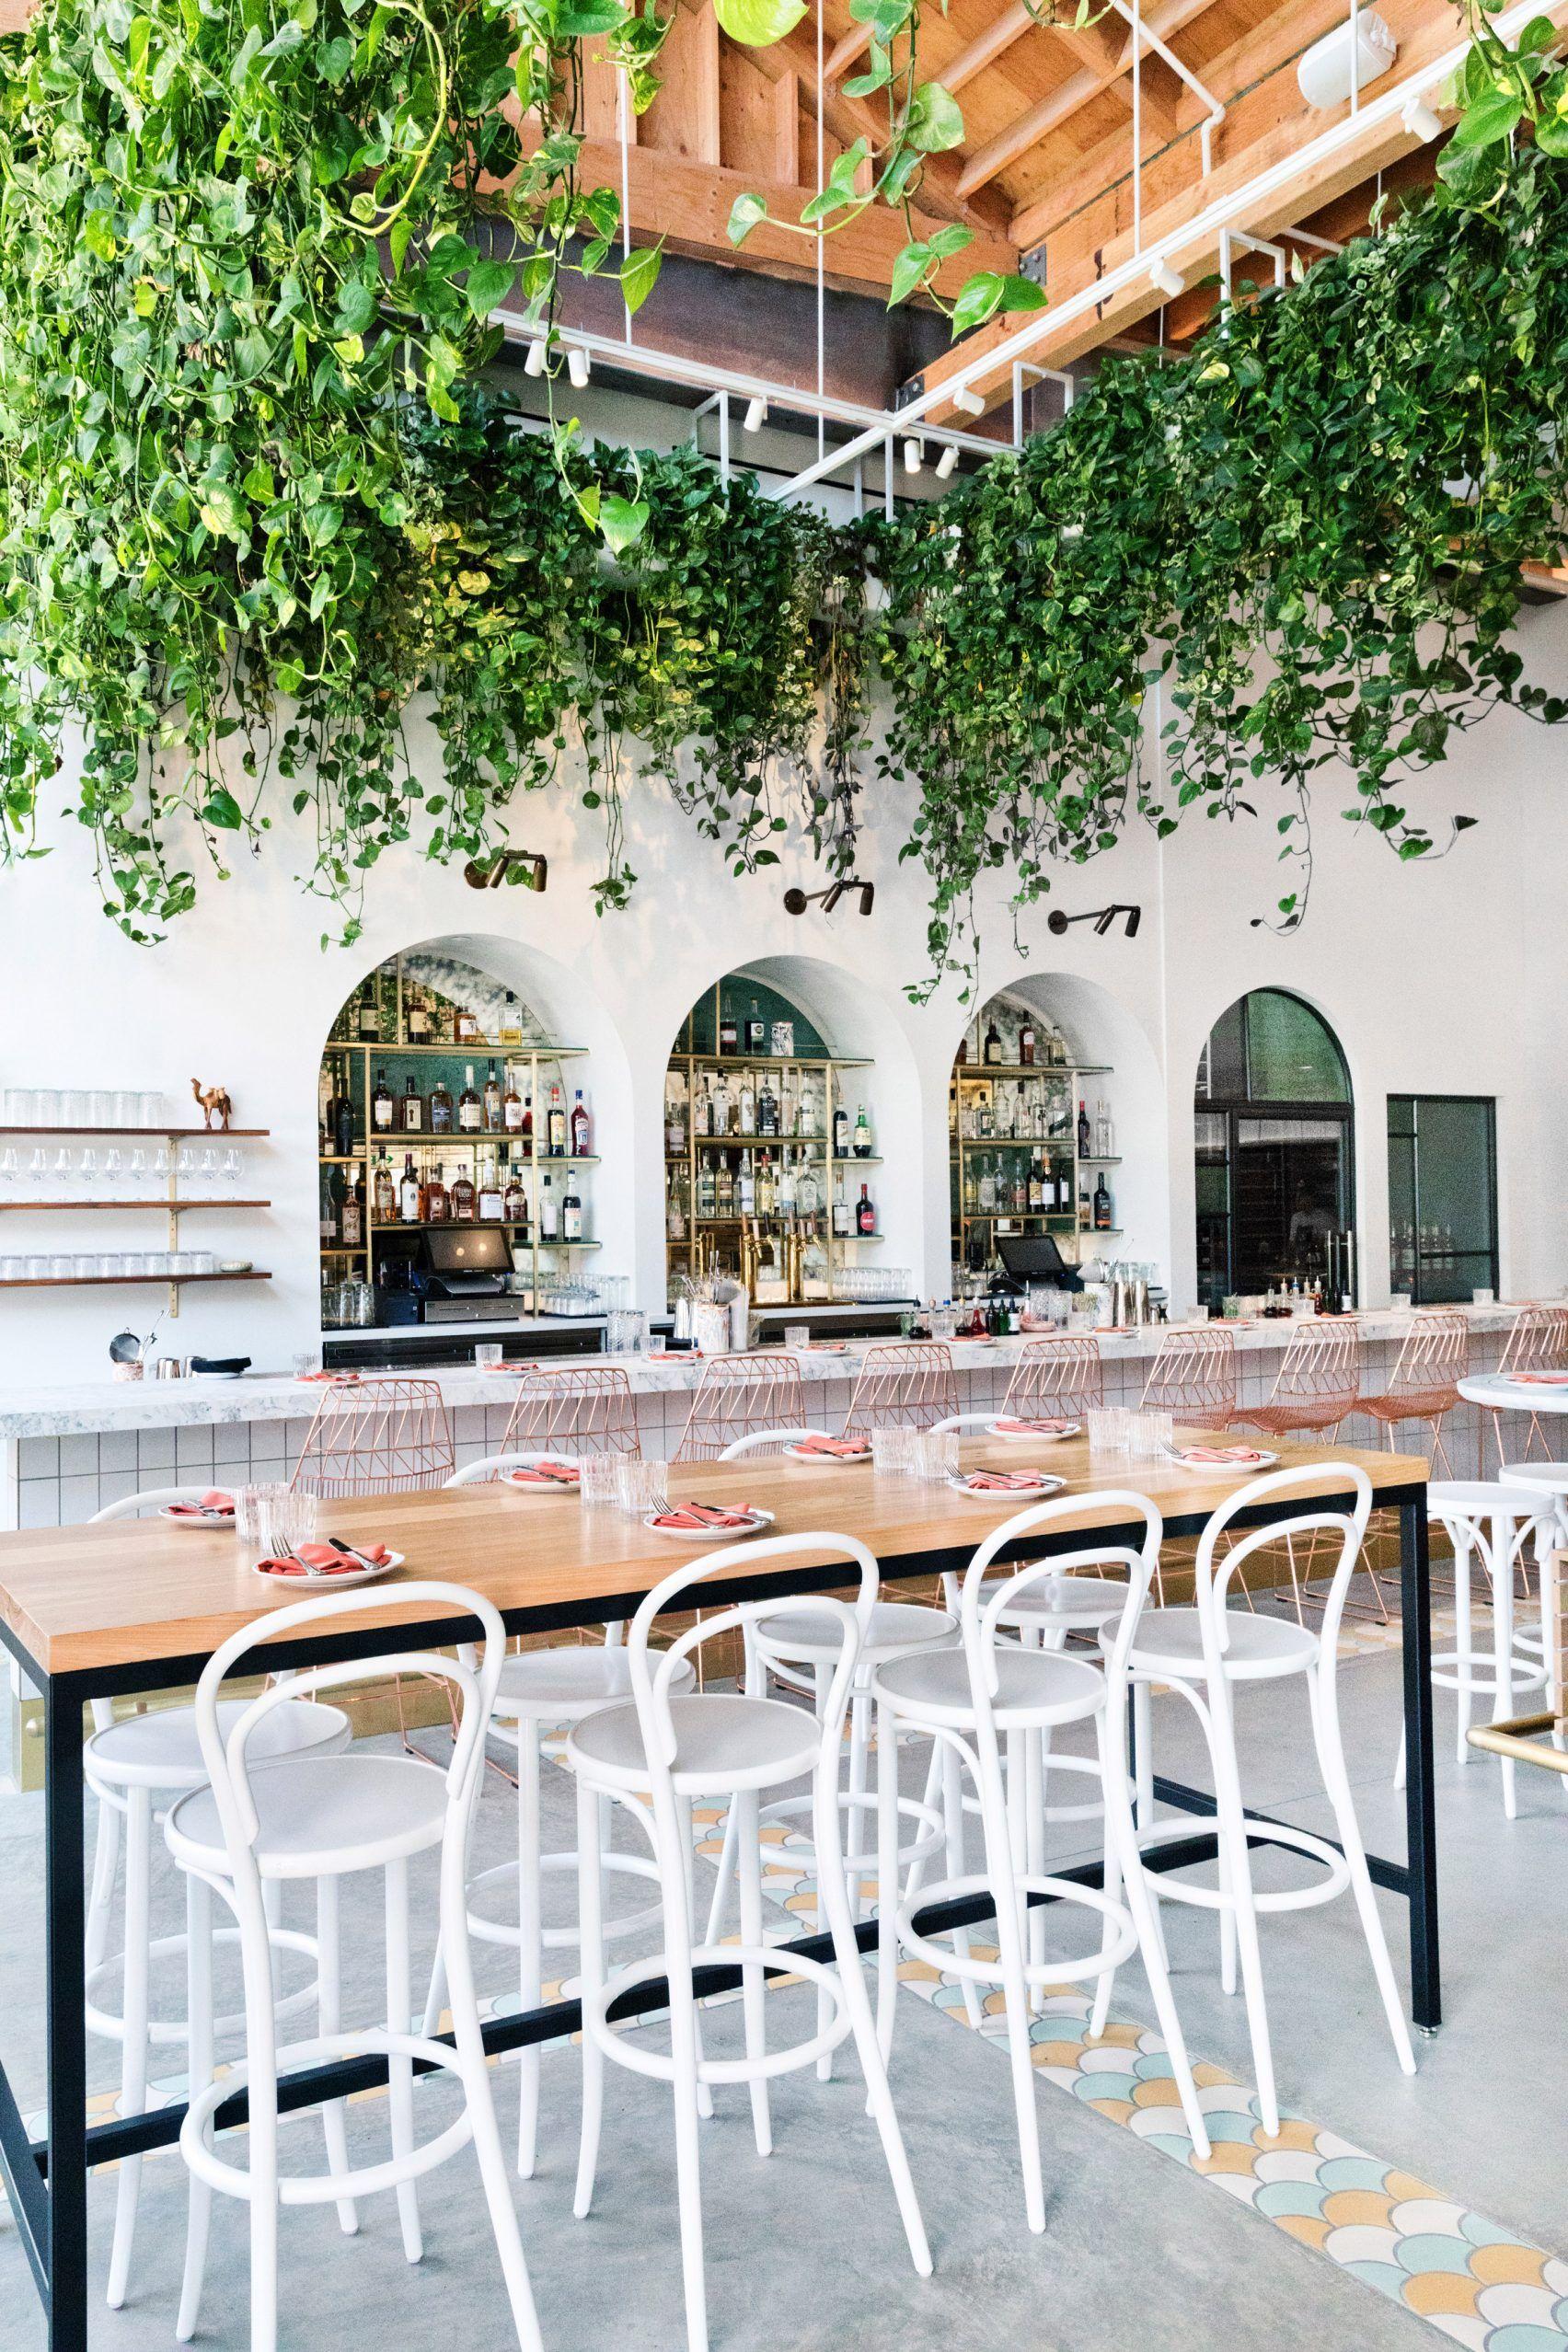 Bavel By Studio Unltd Cafe Design Restaurant Decor Outdoor Restaurant